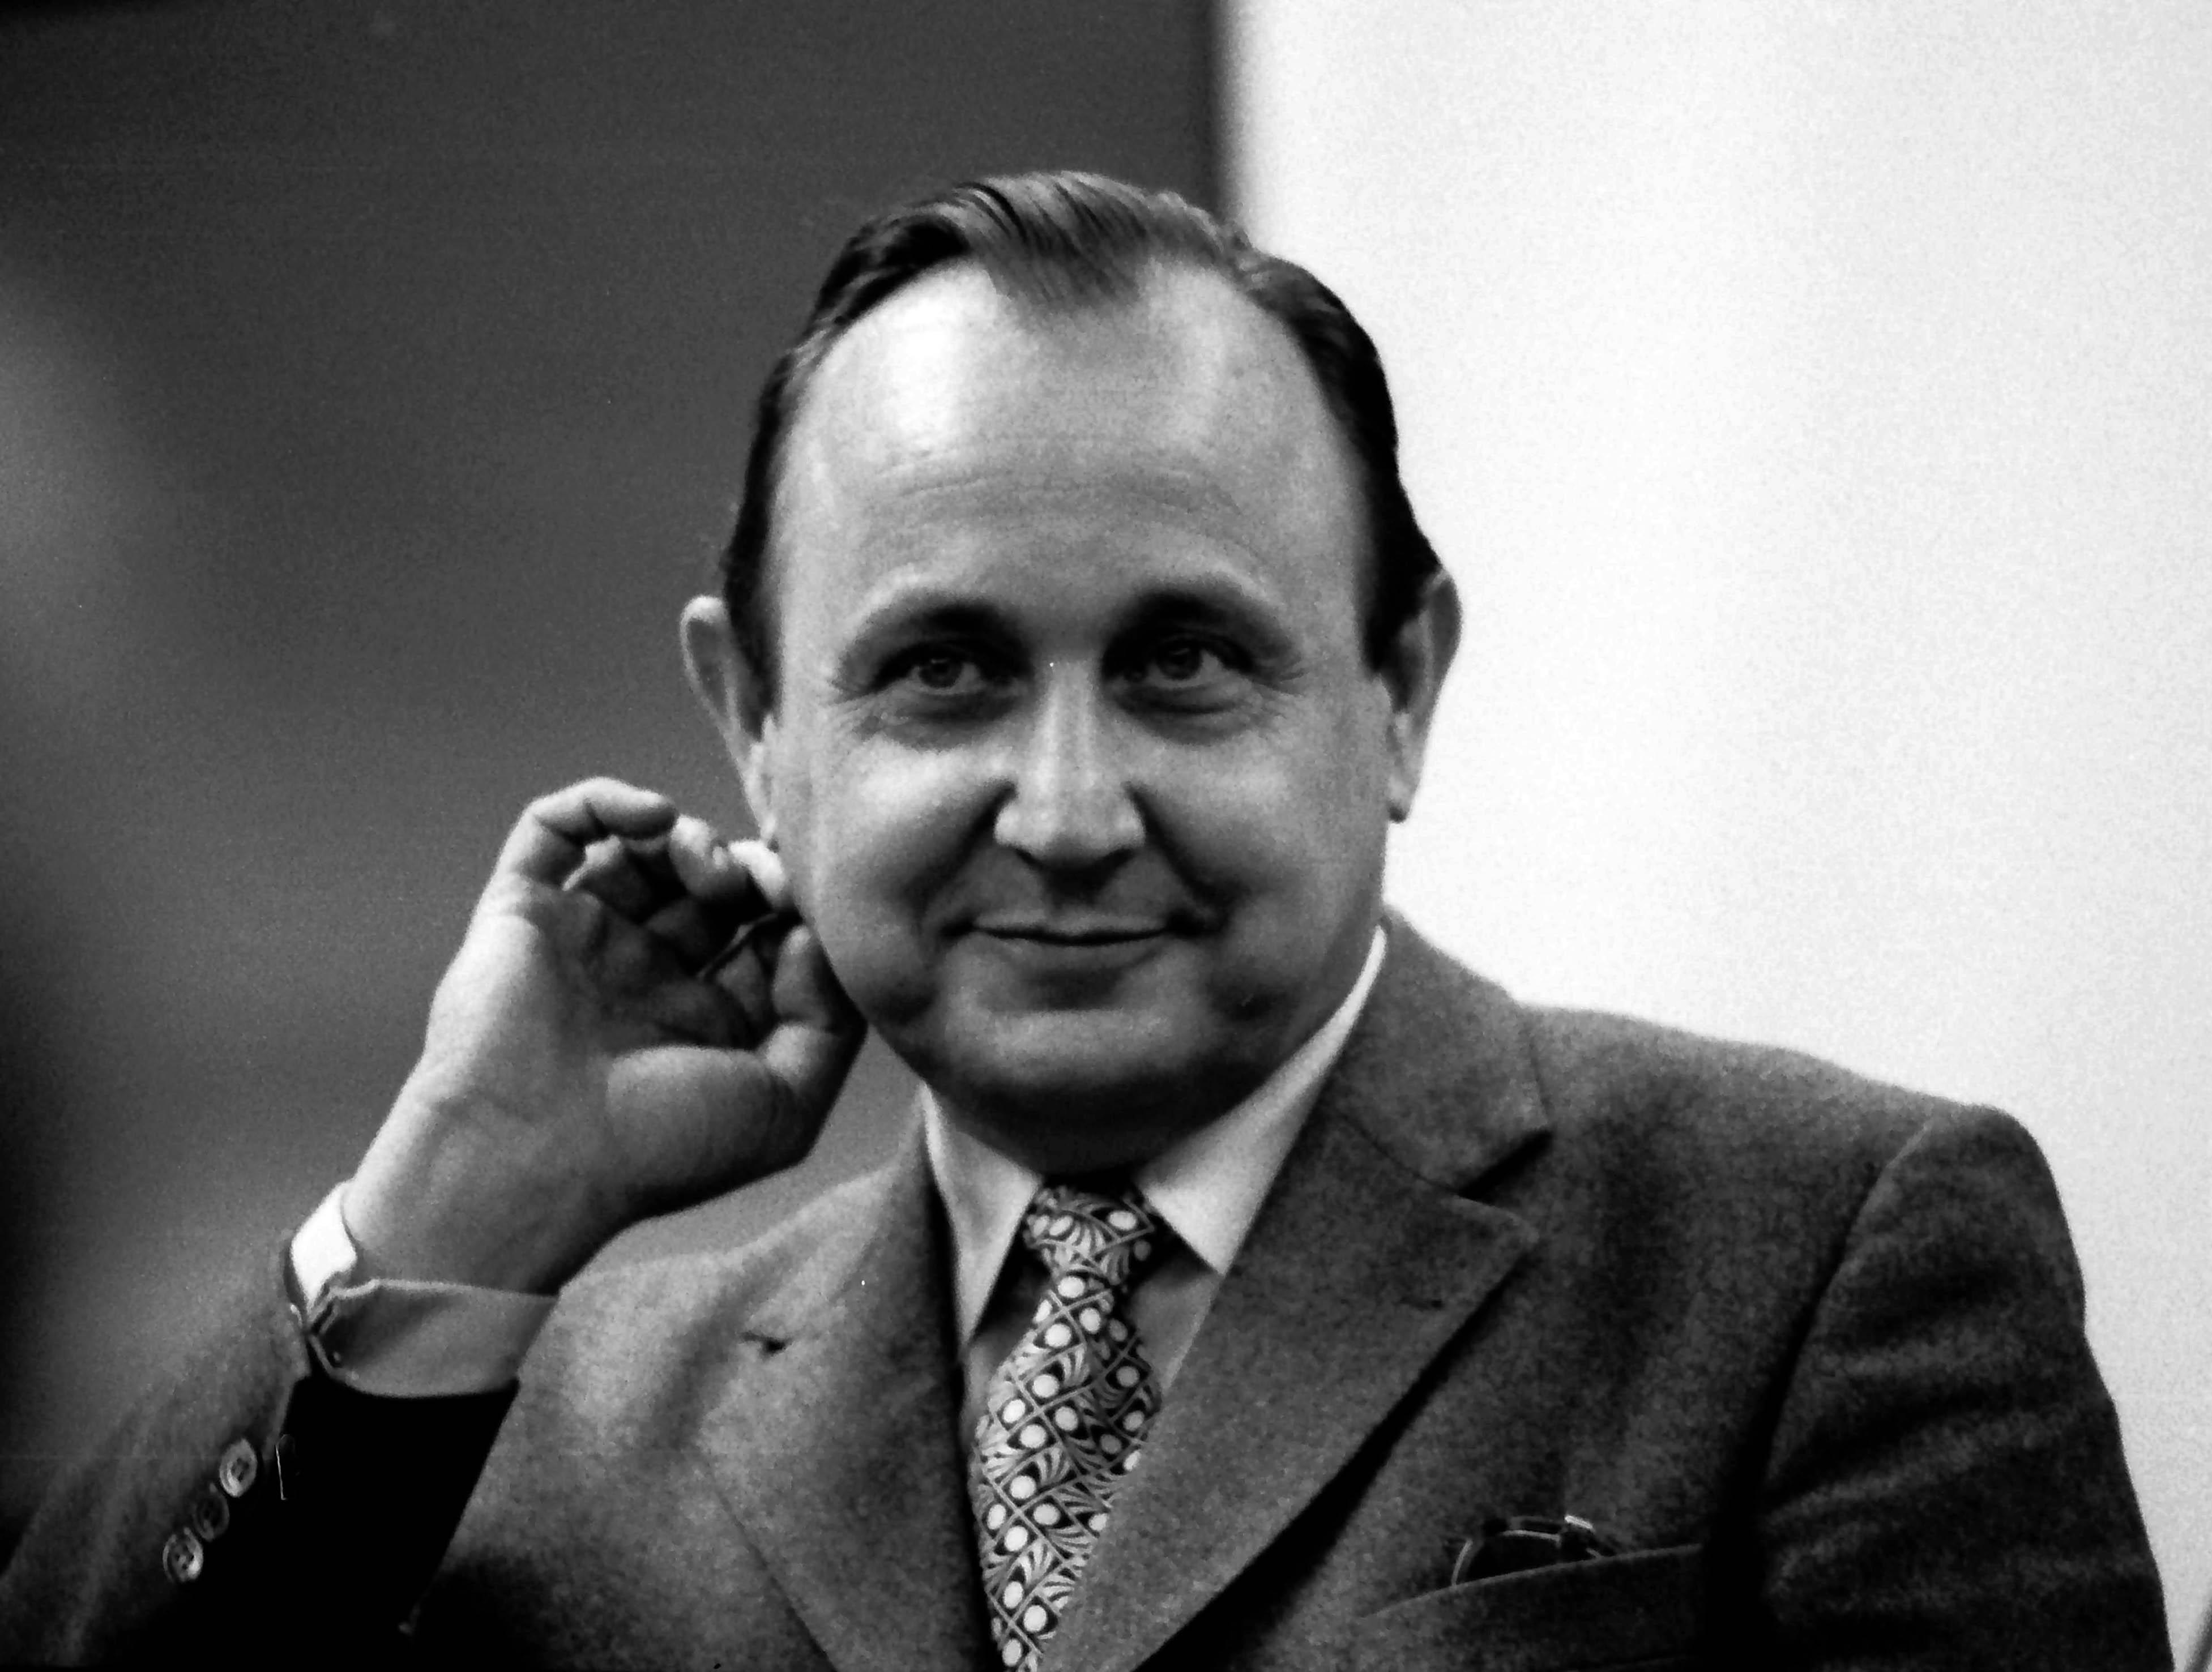 Meghalt Hans-Dietrich Genscher